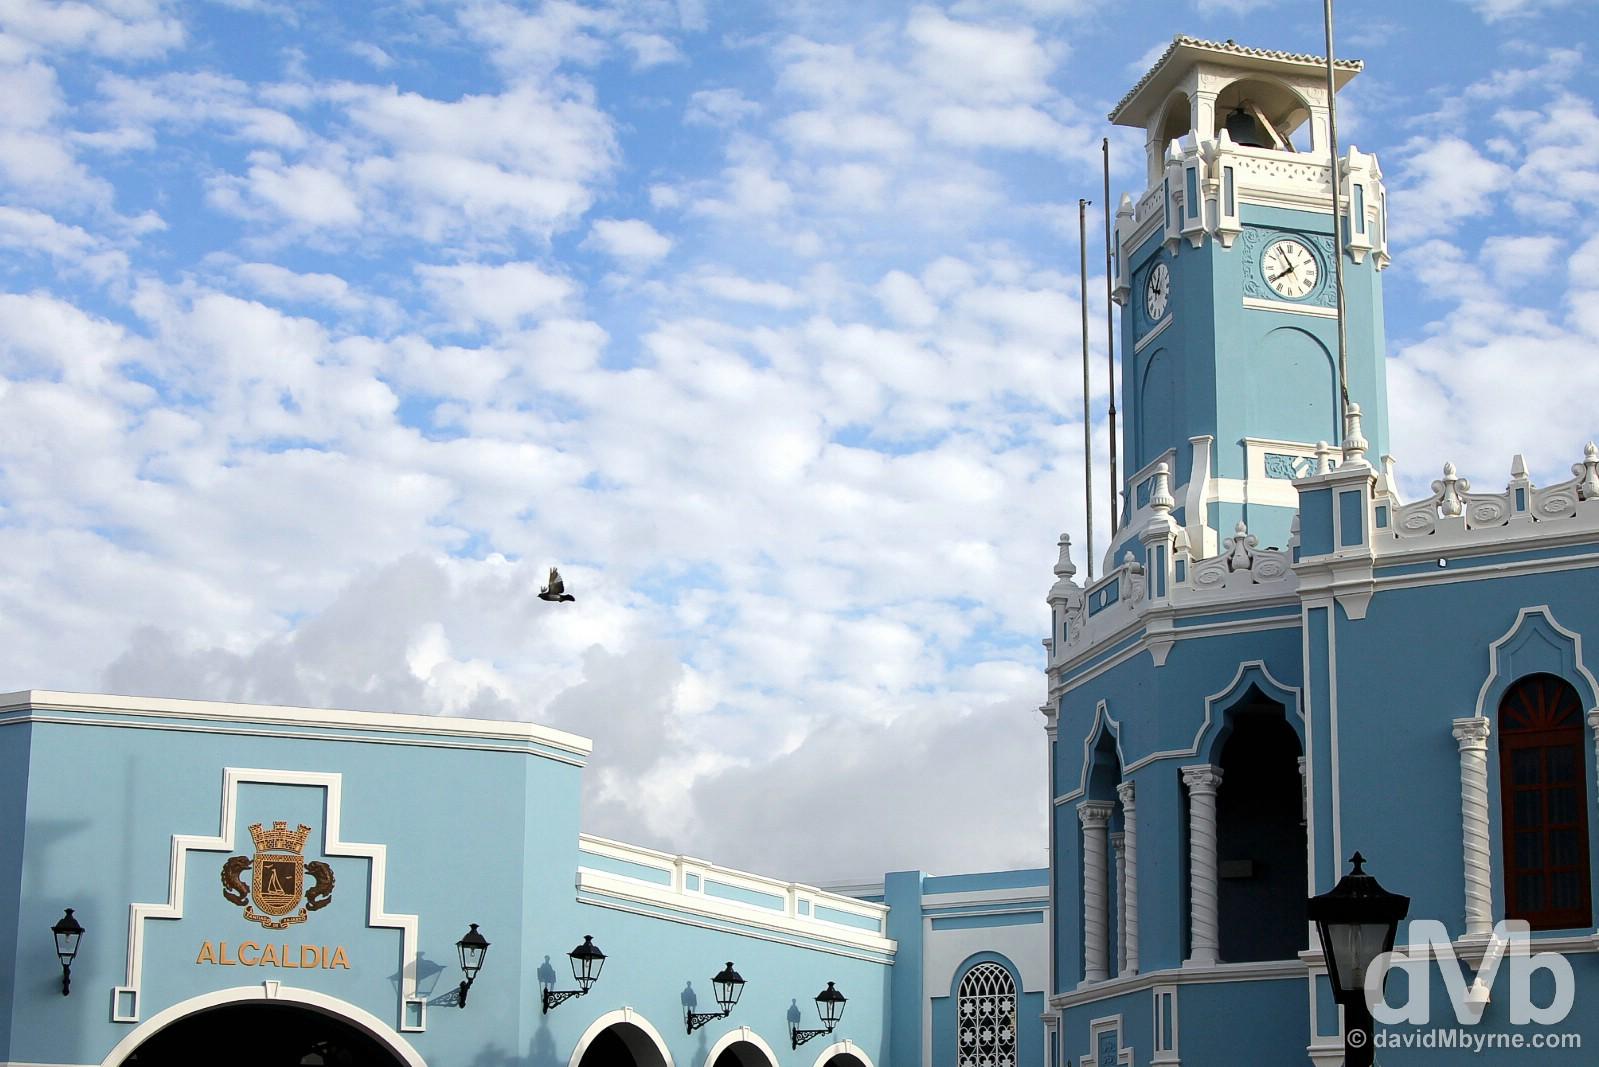 Alcaldia, the Municipality of Fajardo building overlooking Plaza de Fajardo in Fajardo, eastern Puerto Rico, Greater Antilles. June 5, 2015.